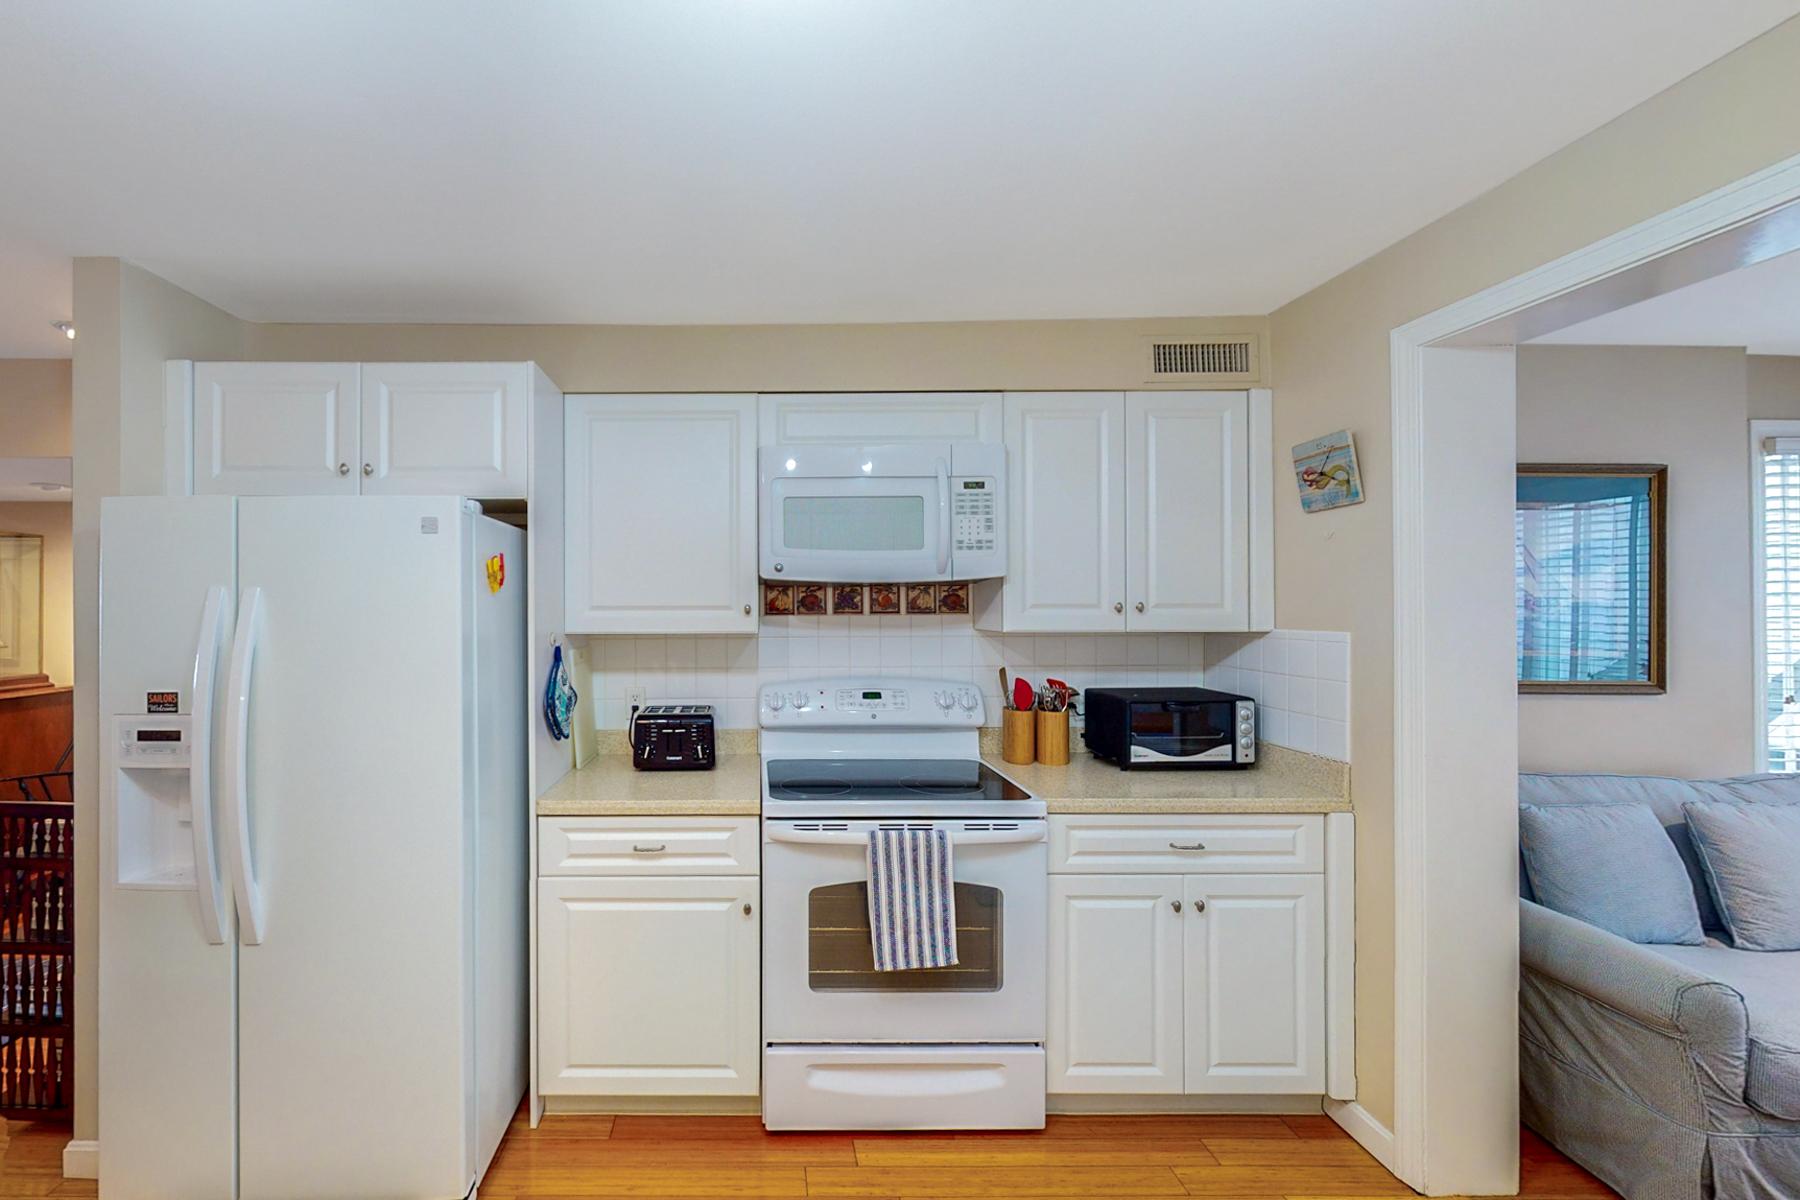 Additional photo for property listing at Coddington Landing 31 Coddington Wharf, 7 Newport, Rhode Island 02840 United States